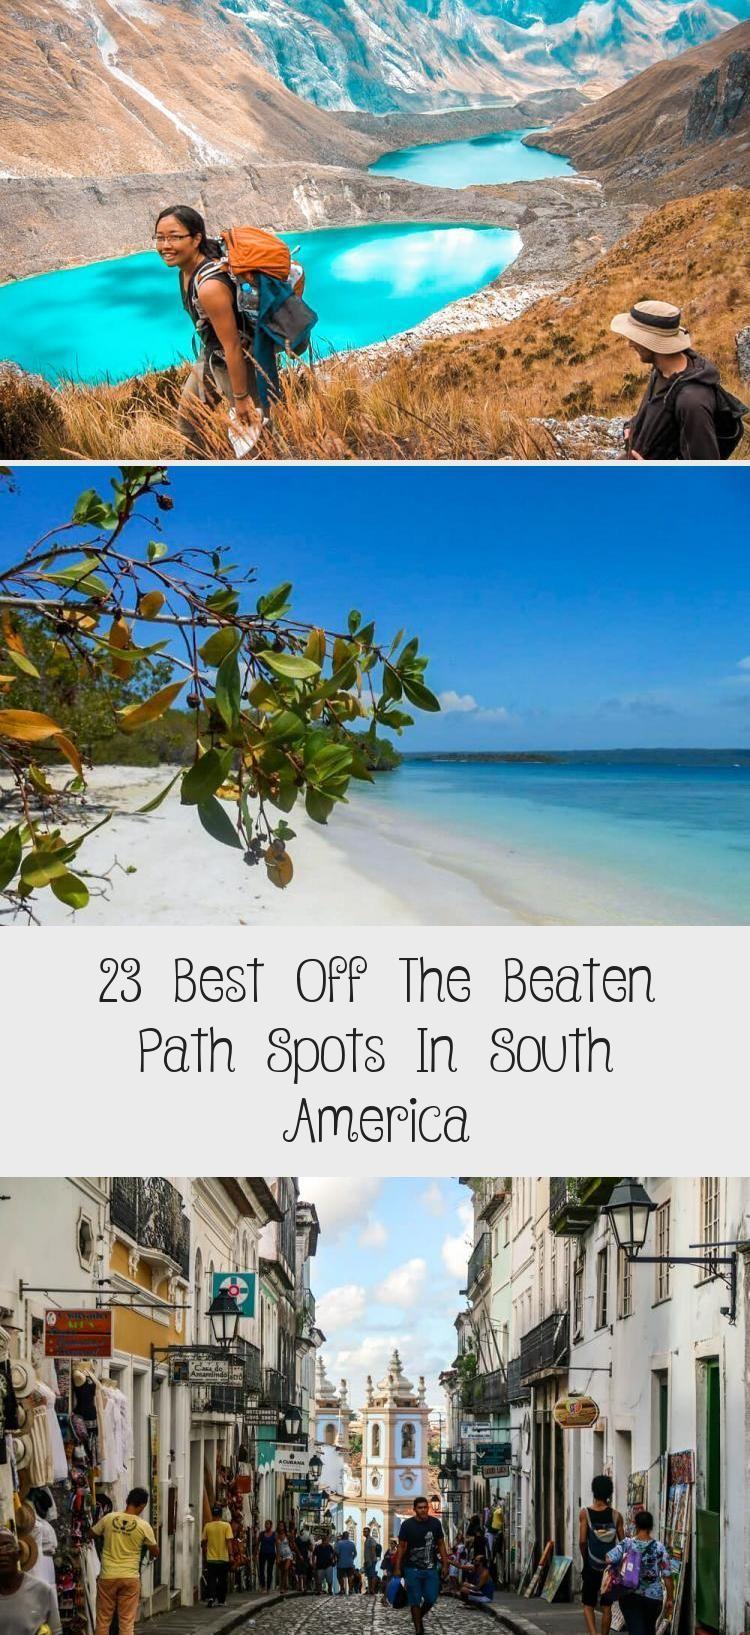 South America Memes Png Southamericavideosrecipes Southamericatravel2weeks Southamericamen Sout South America Travel America Beaches America Travel